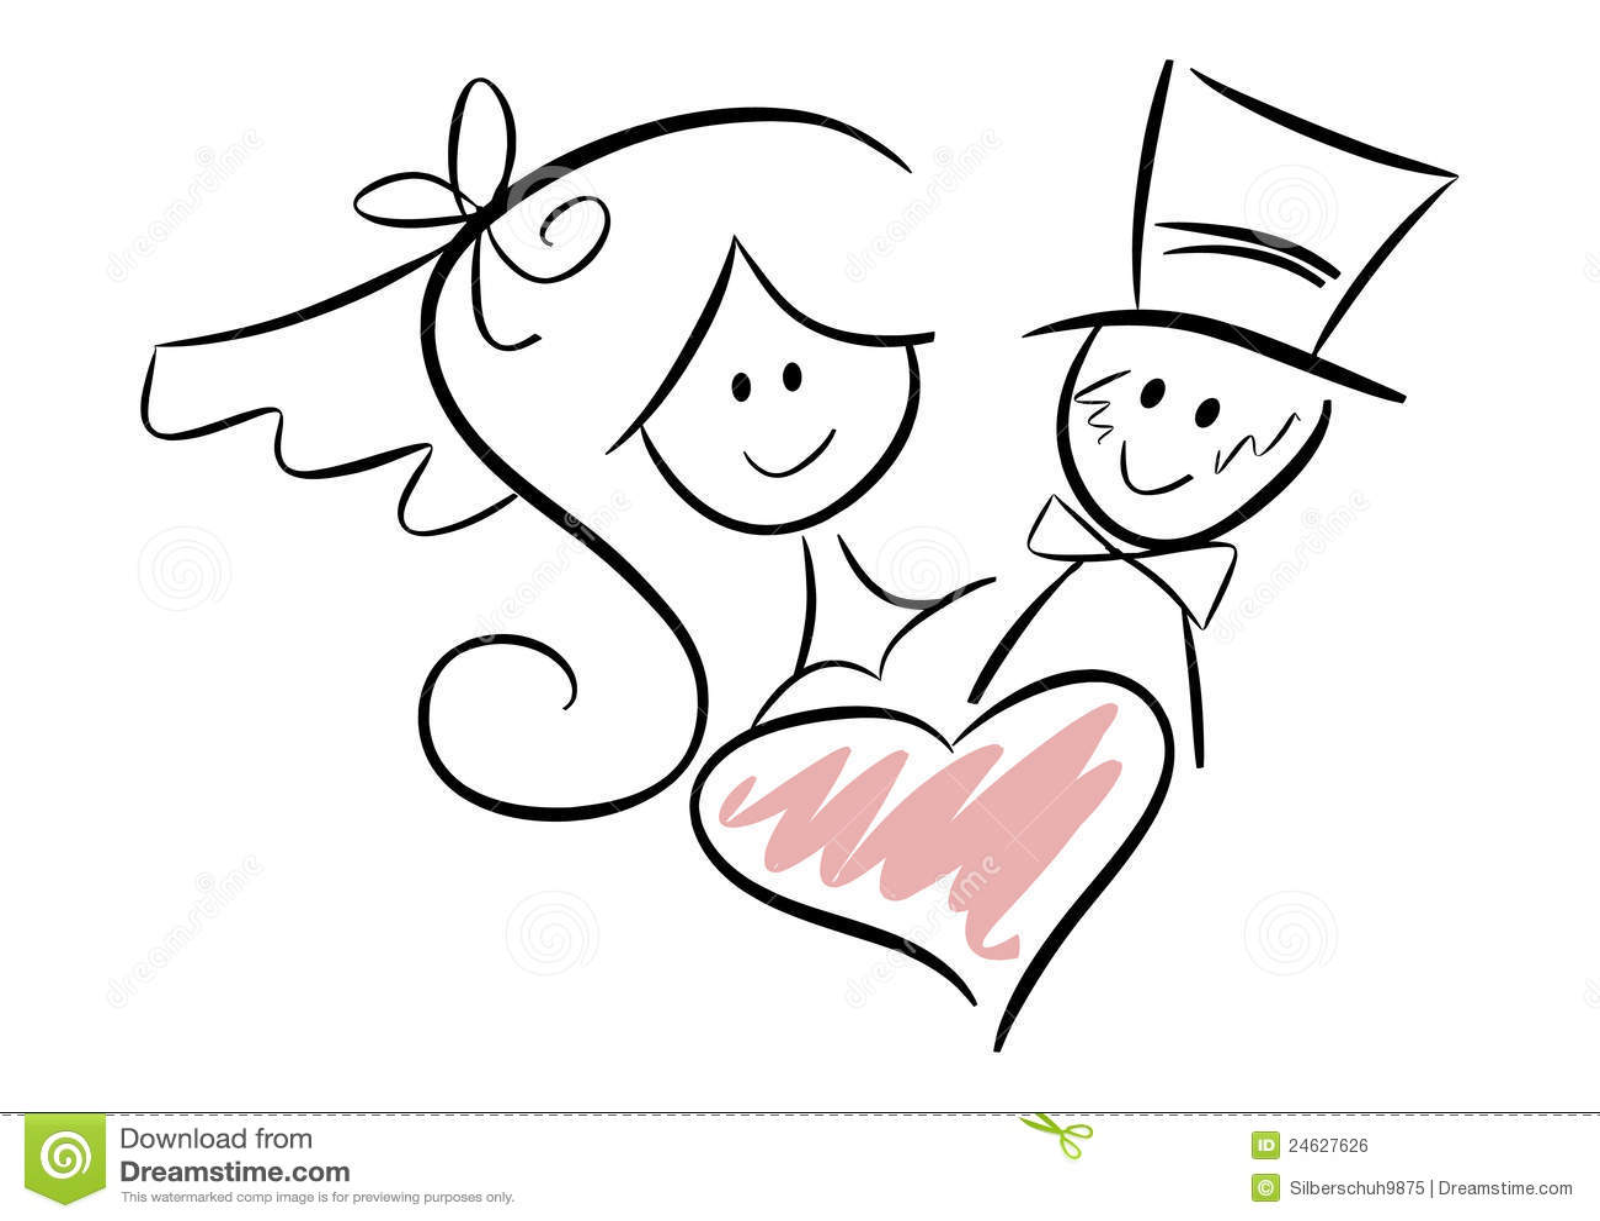 free clipart of wedding couple - photo #40